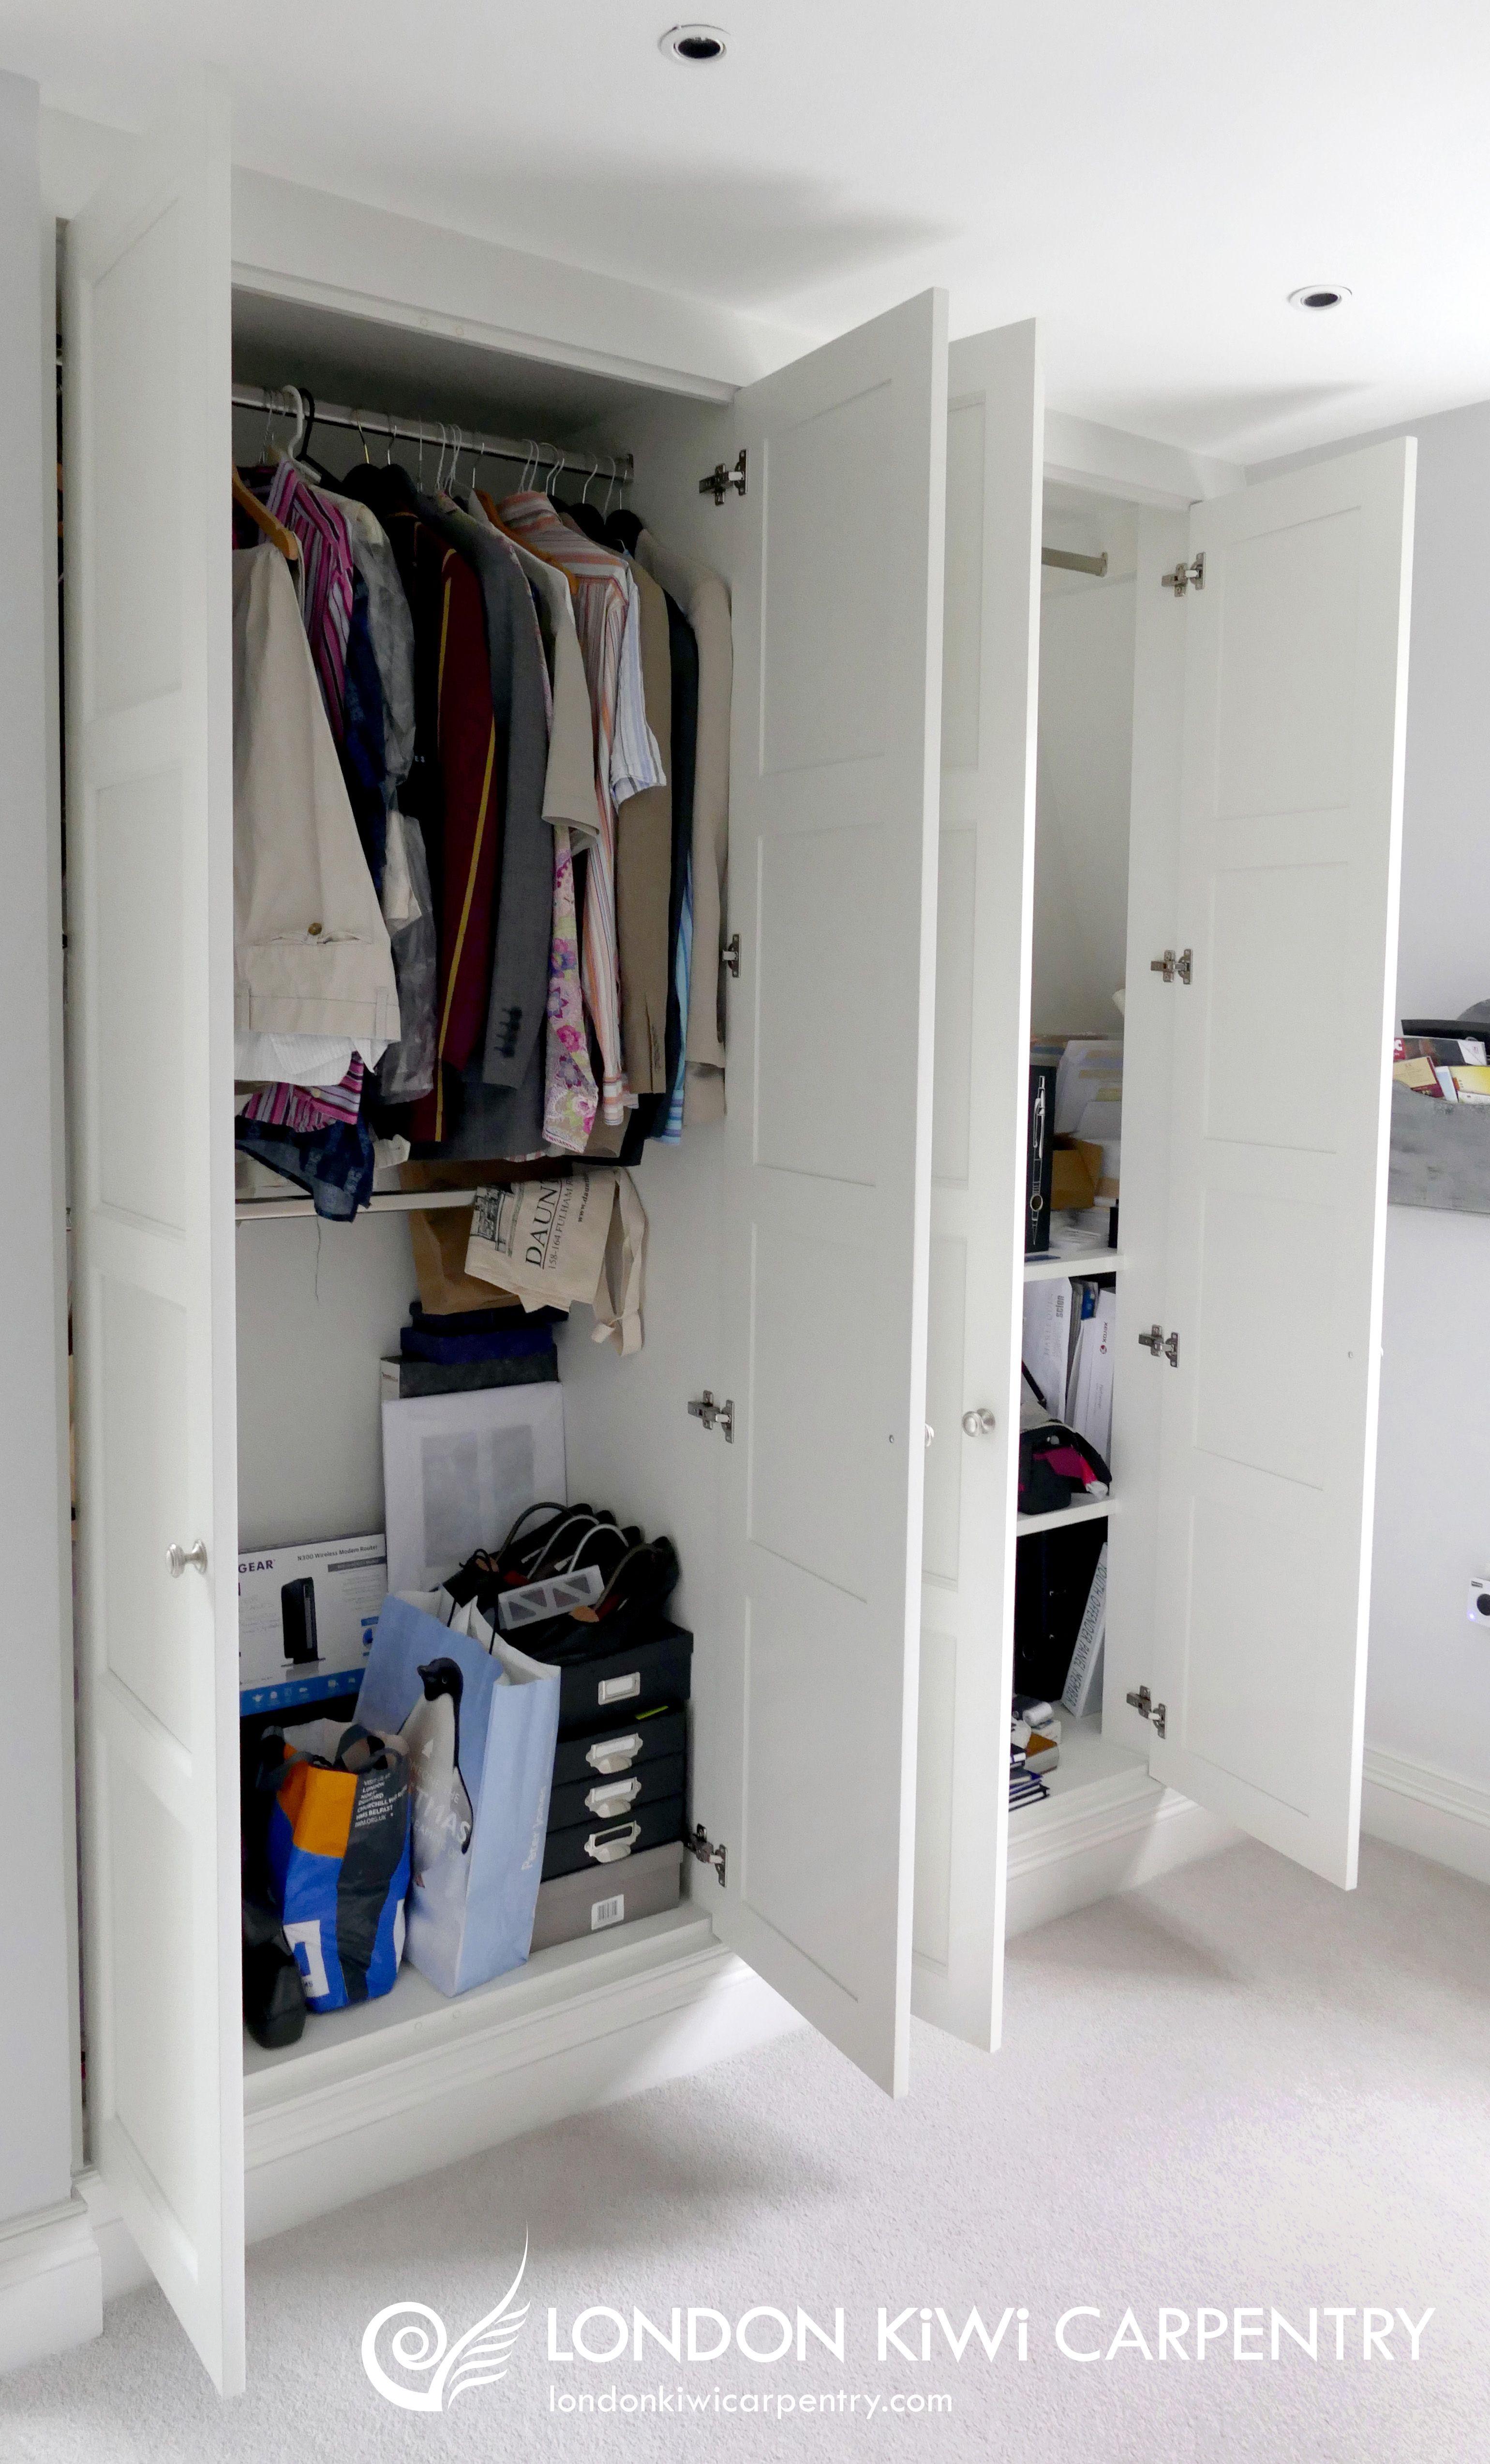 Double wardrobe (open) with shelving by London Kiwi Carpentry #storage #interiors # & Double wardrobe (open) with shelving by London Kiwi Carpentry ...